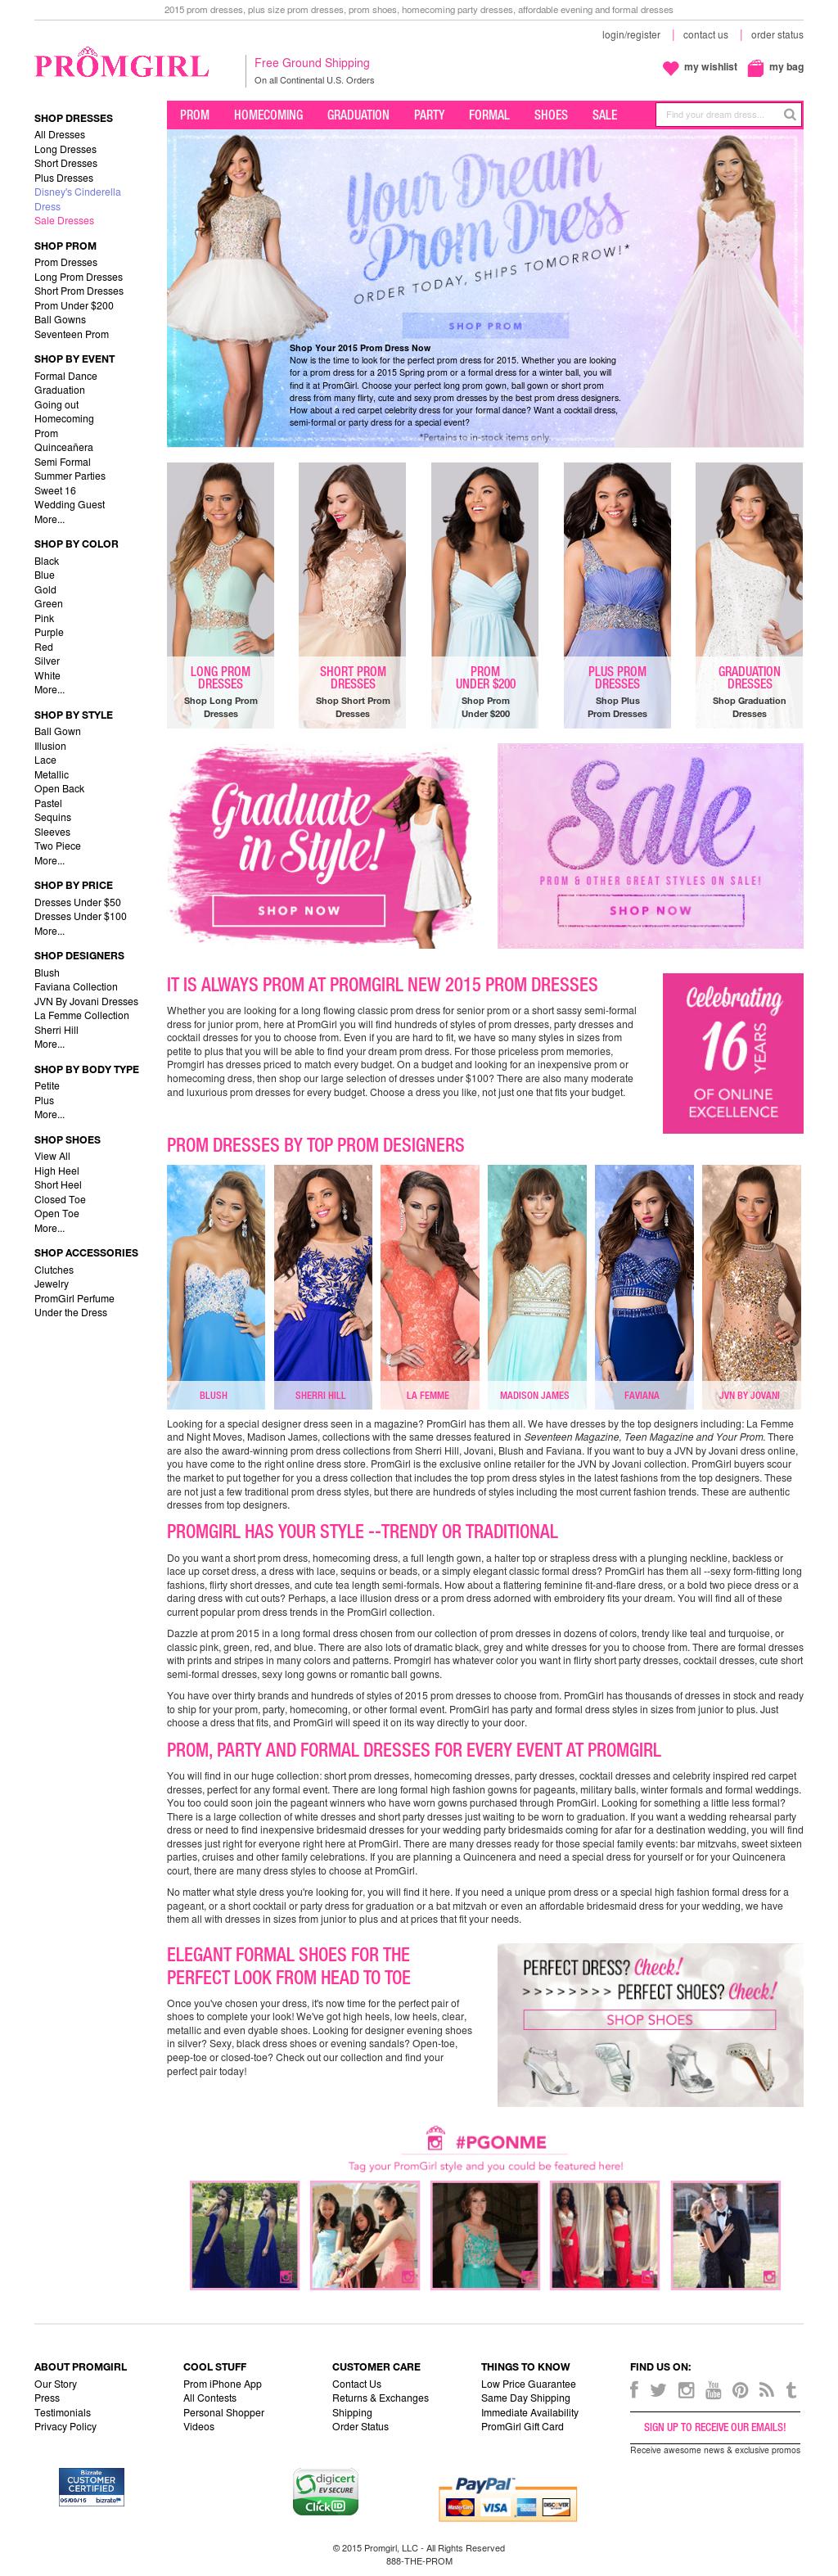 ac637834297 Promgirl Competitors